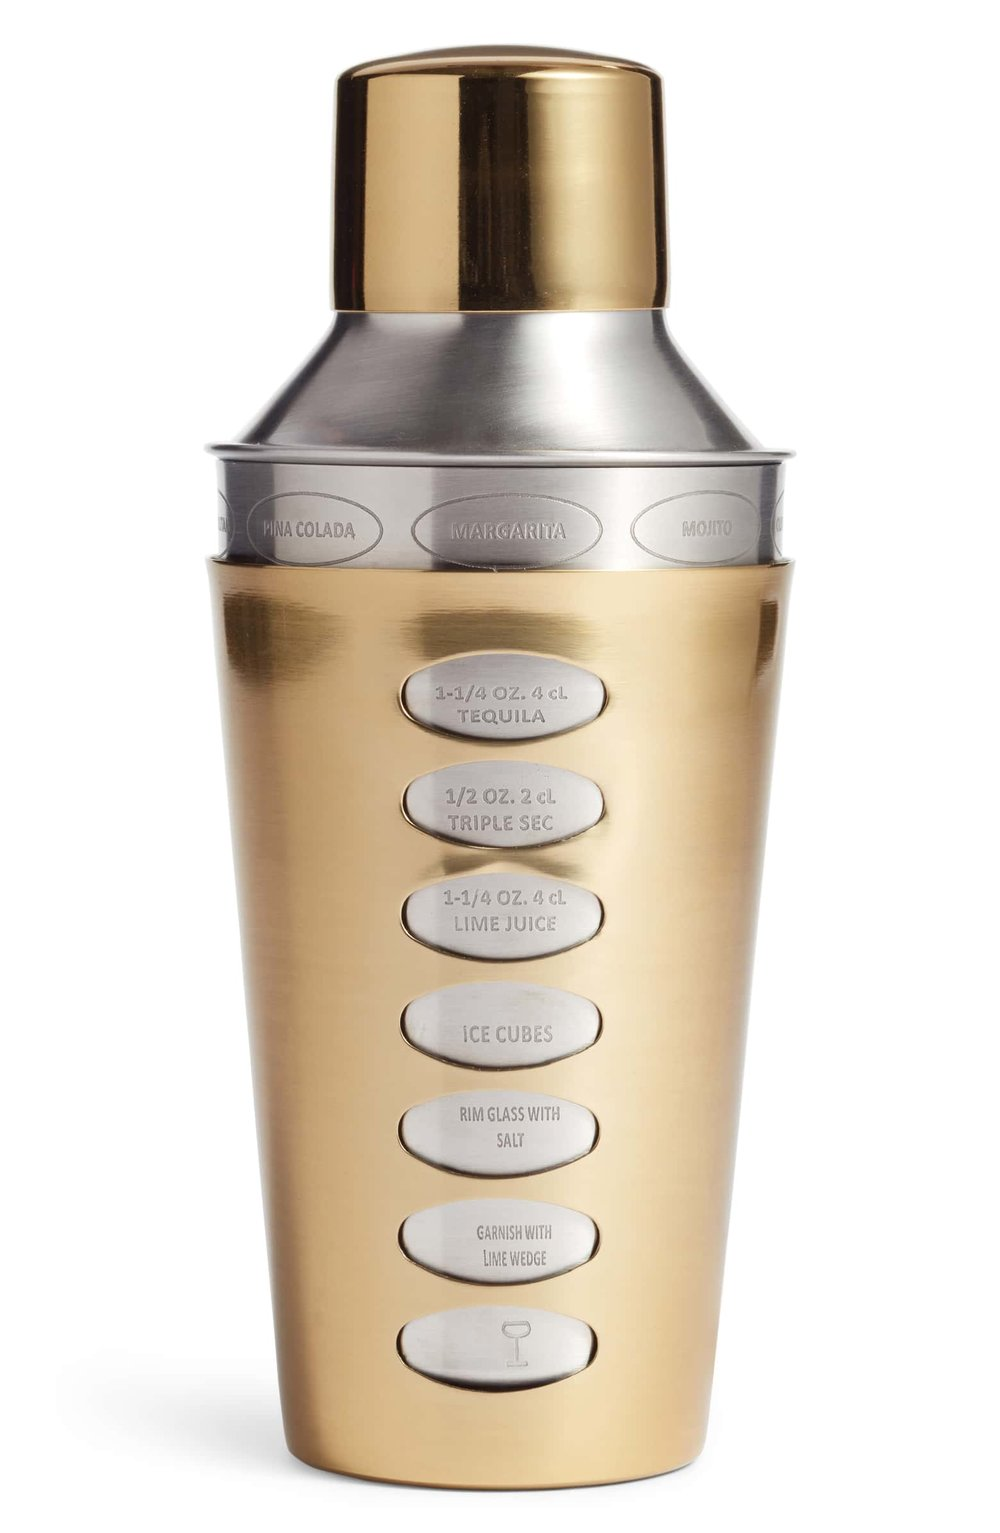 Recipe Cocktail Shaker - $39 on Nordstrom